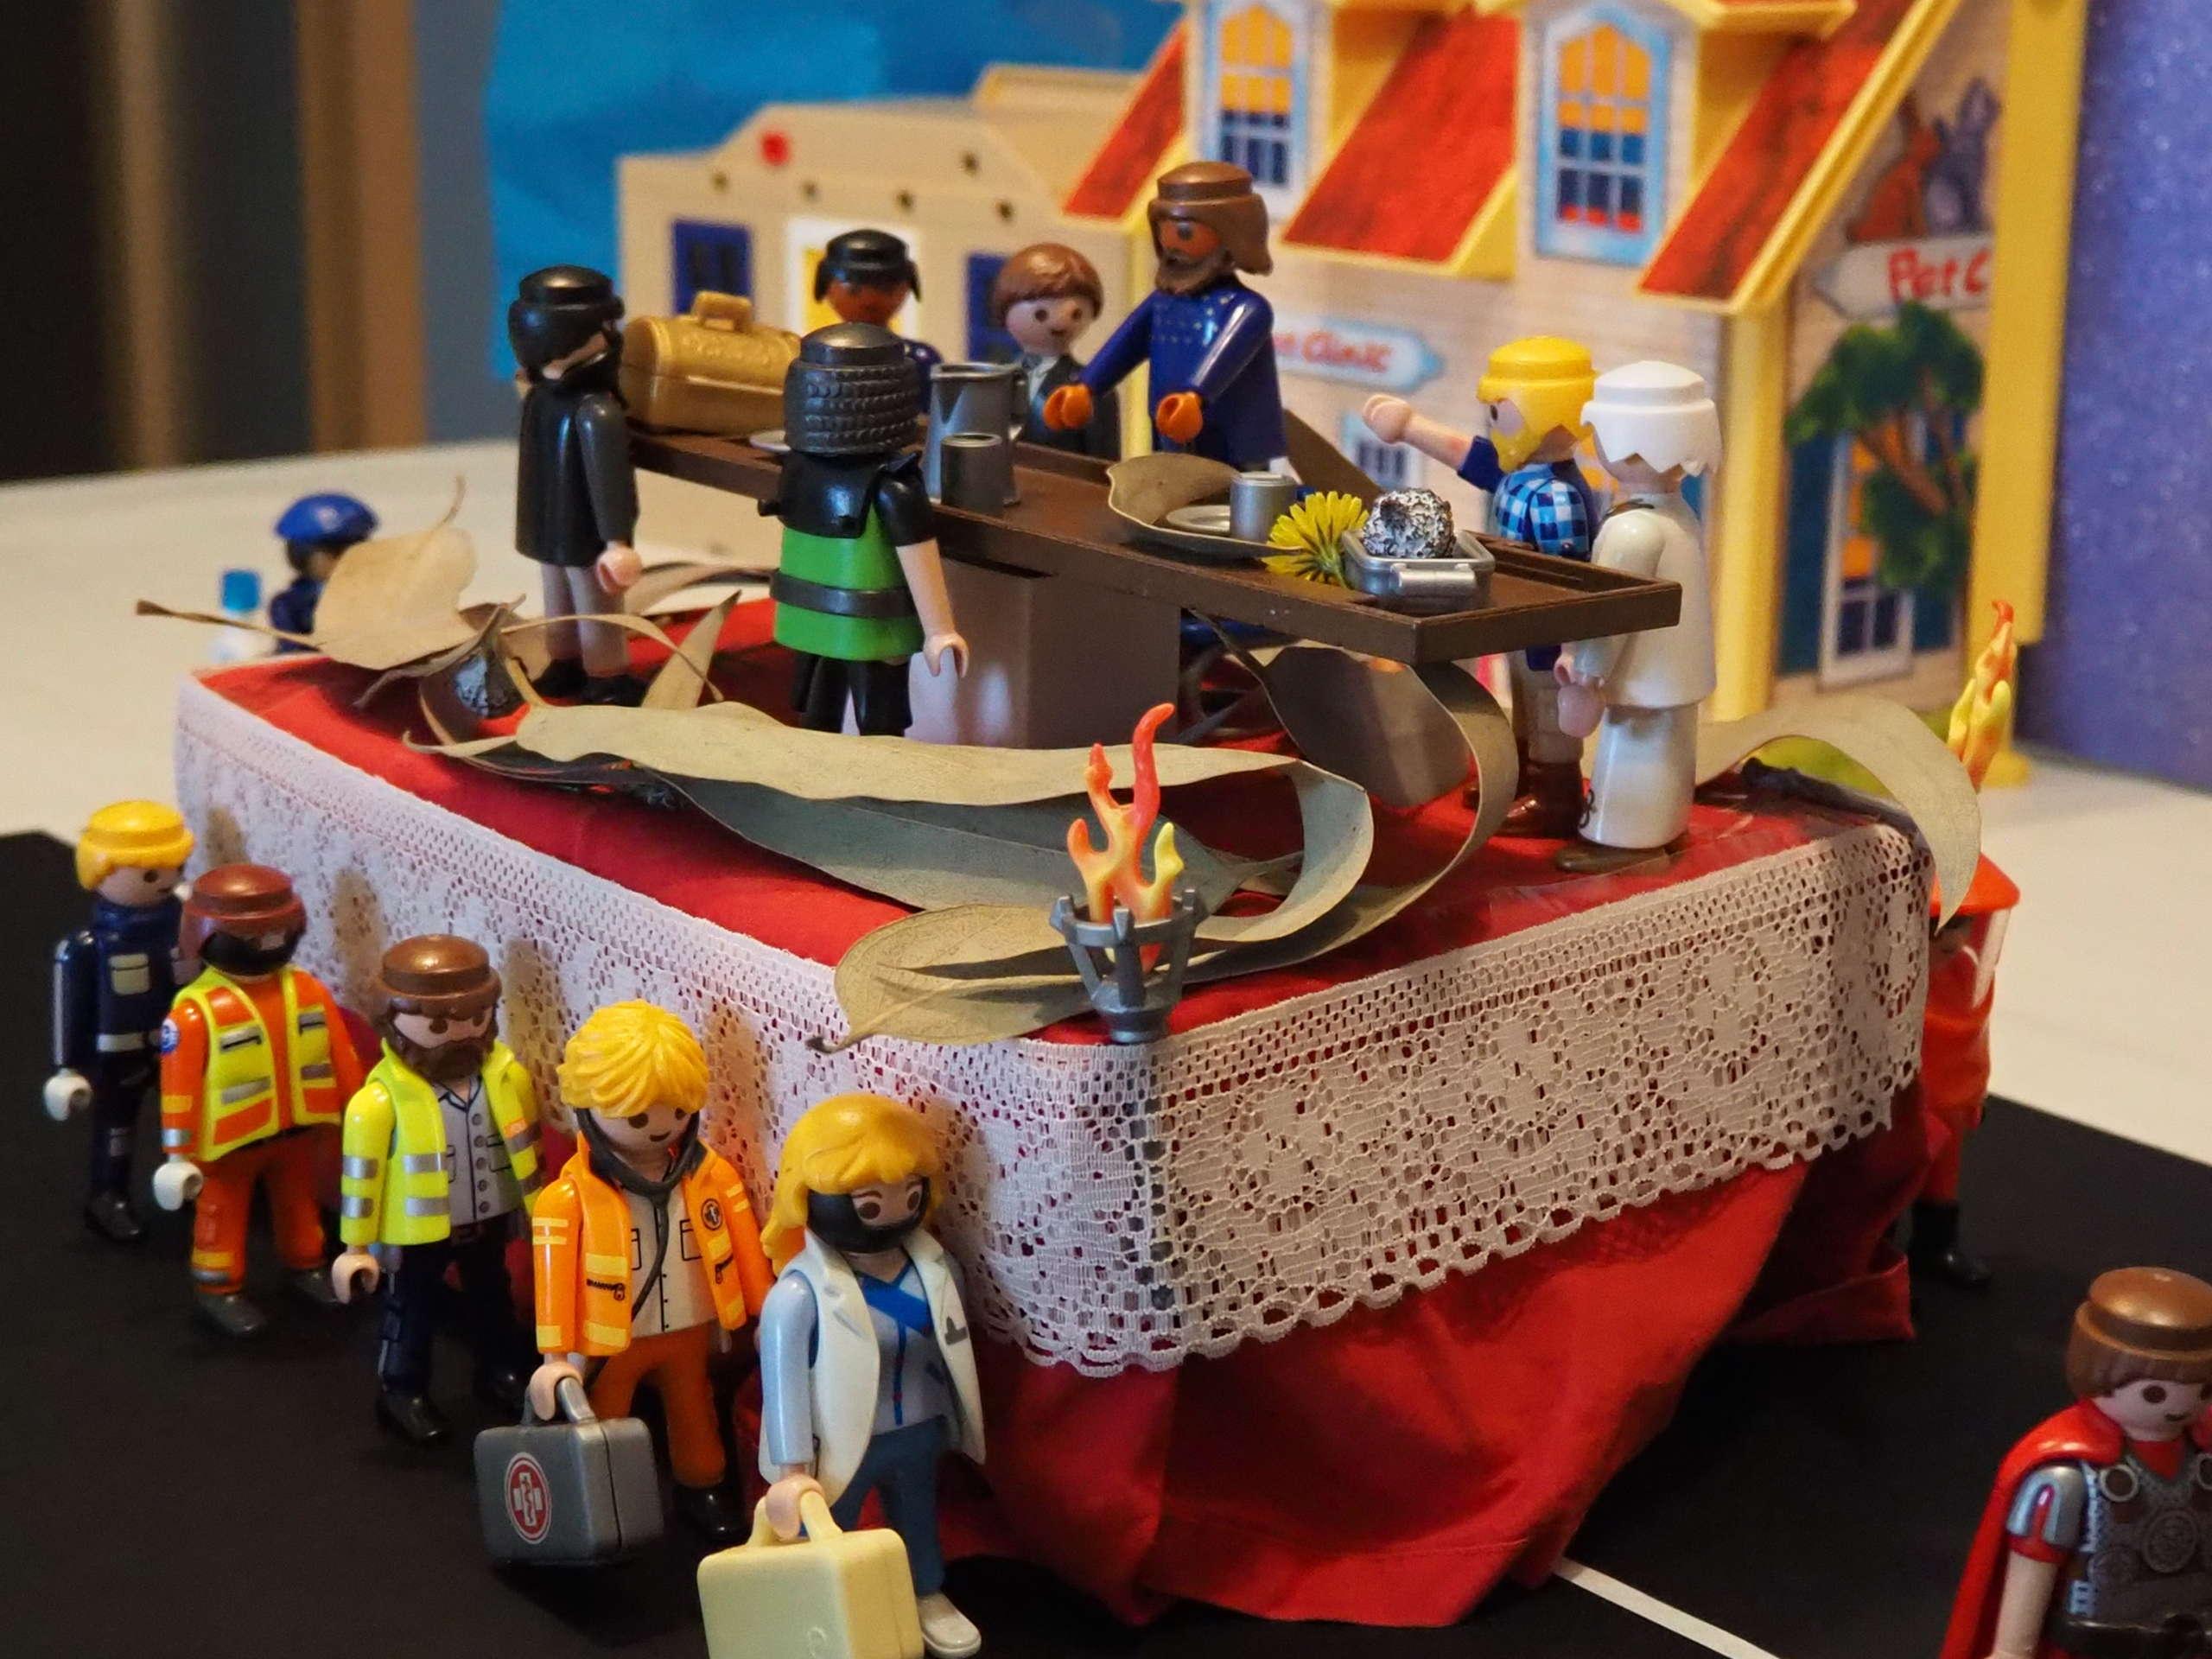 Procesión de Semana Santa con Playmobils